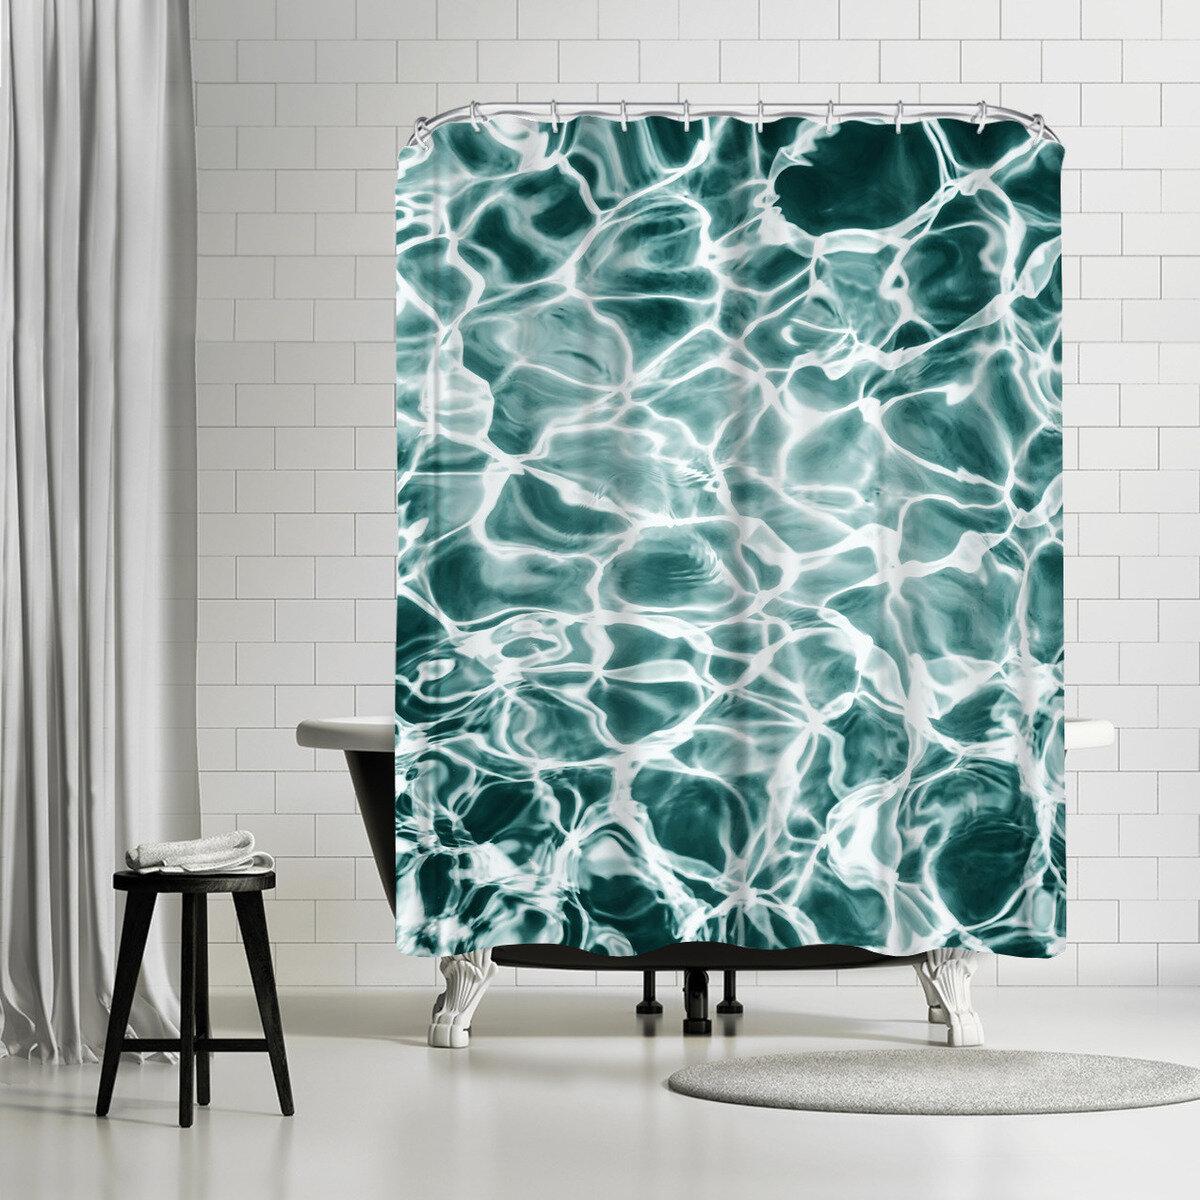 East Urban Home Sisi And Seb Abstract Water Single Shower Curtain Wayfair